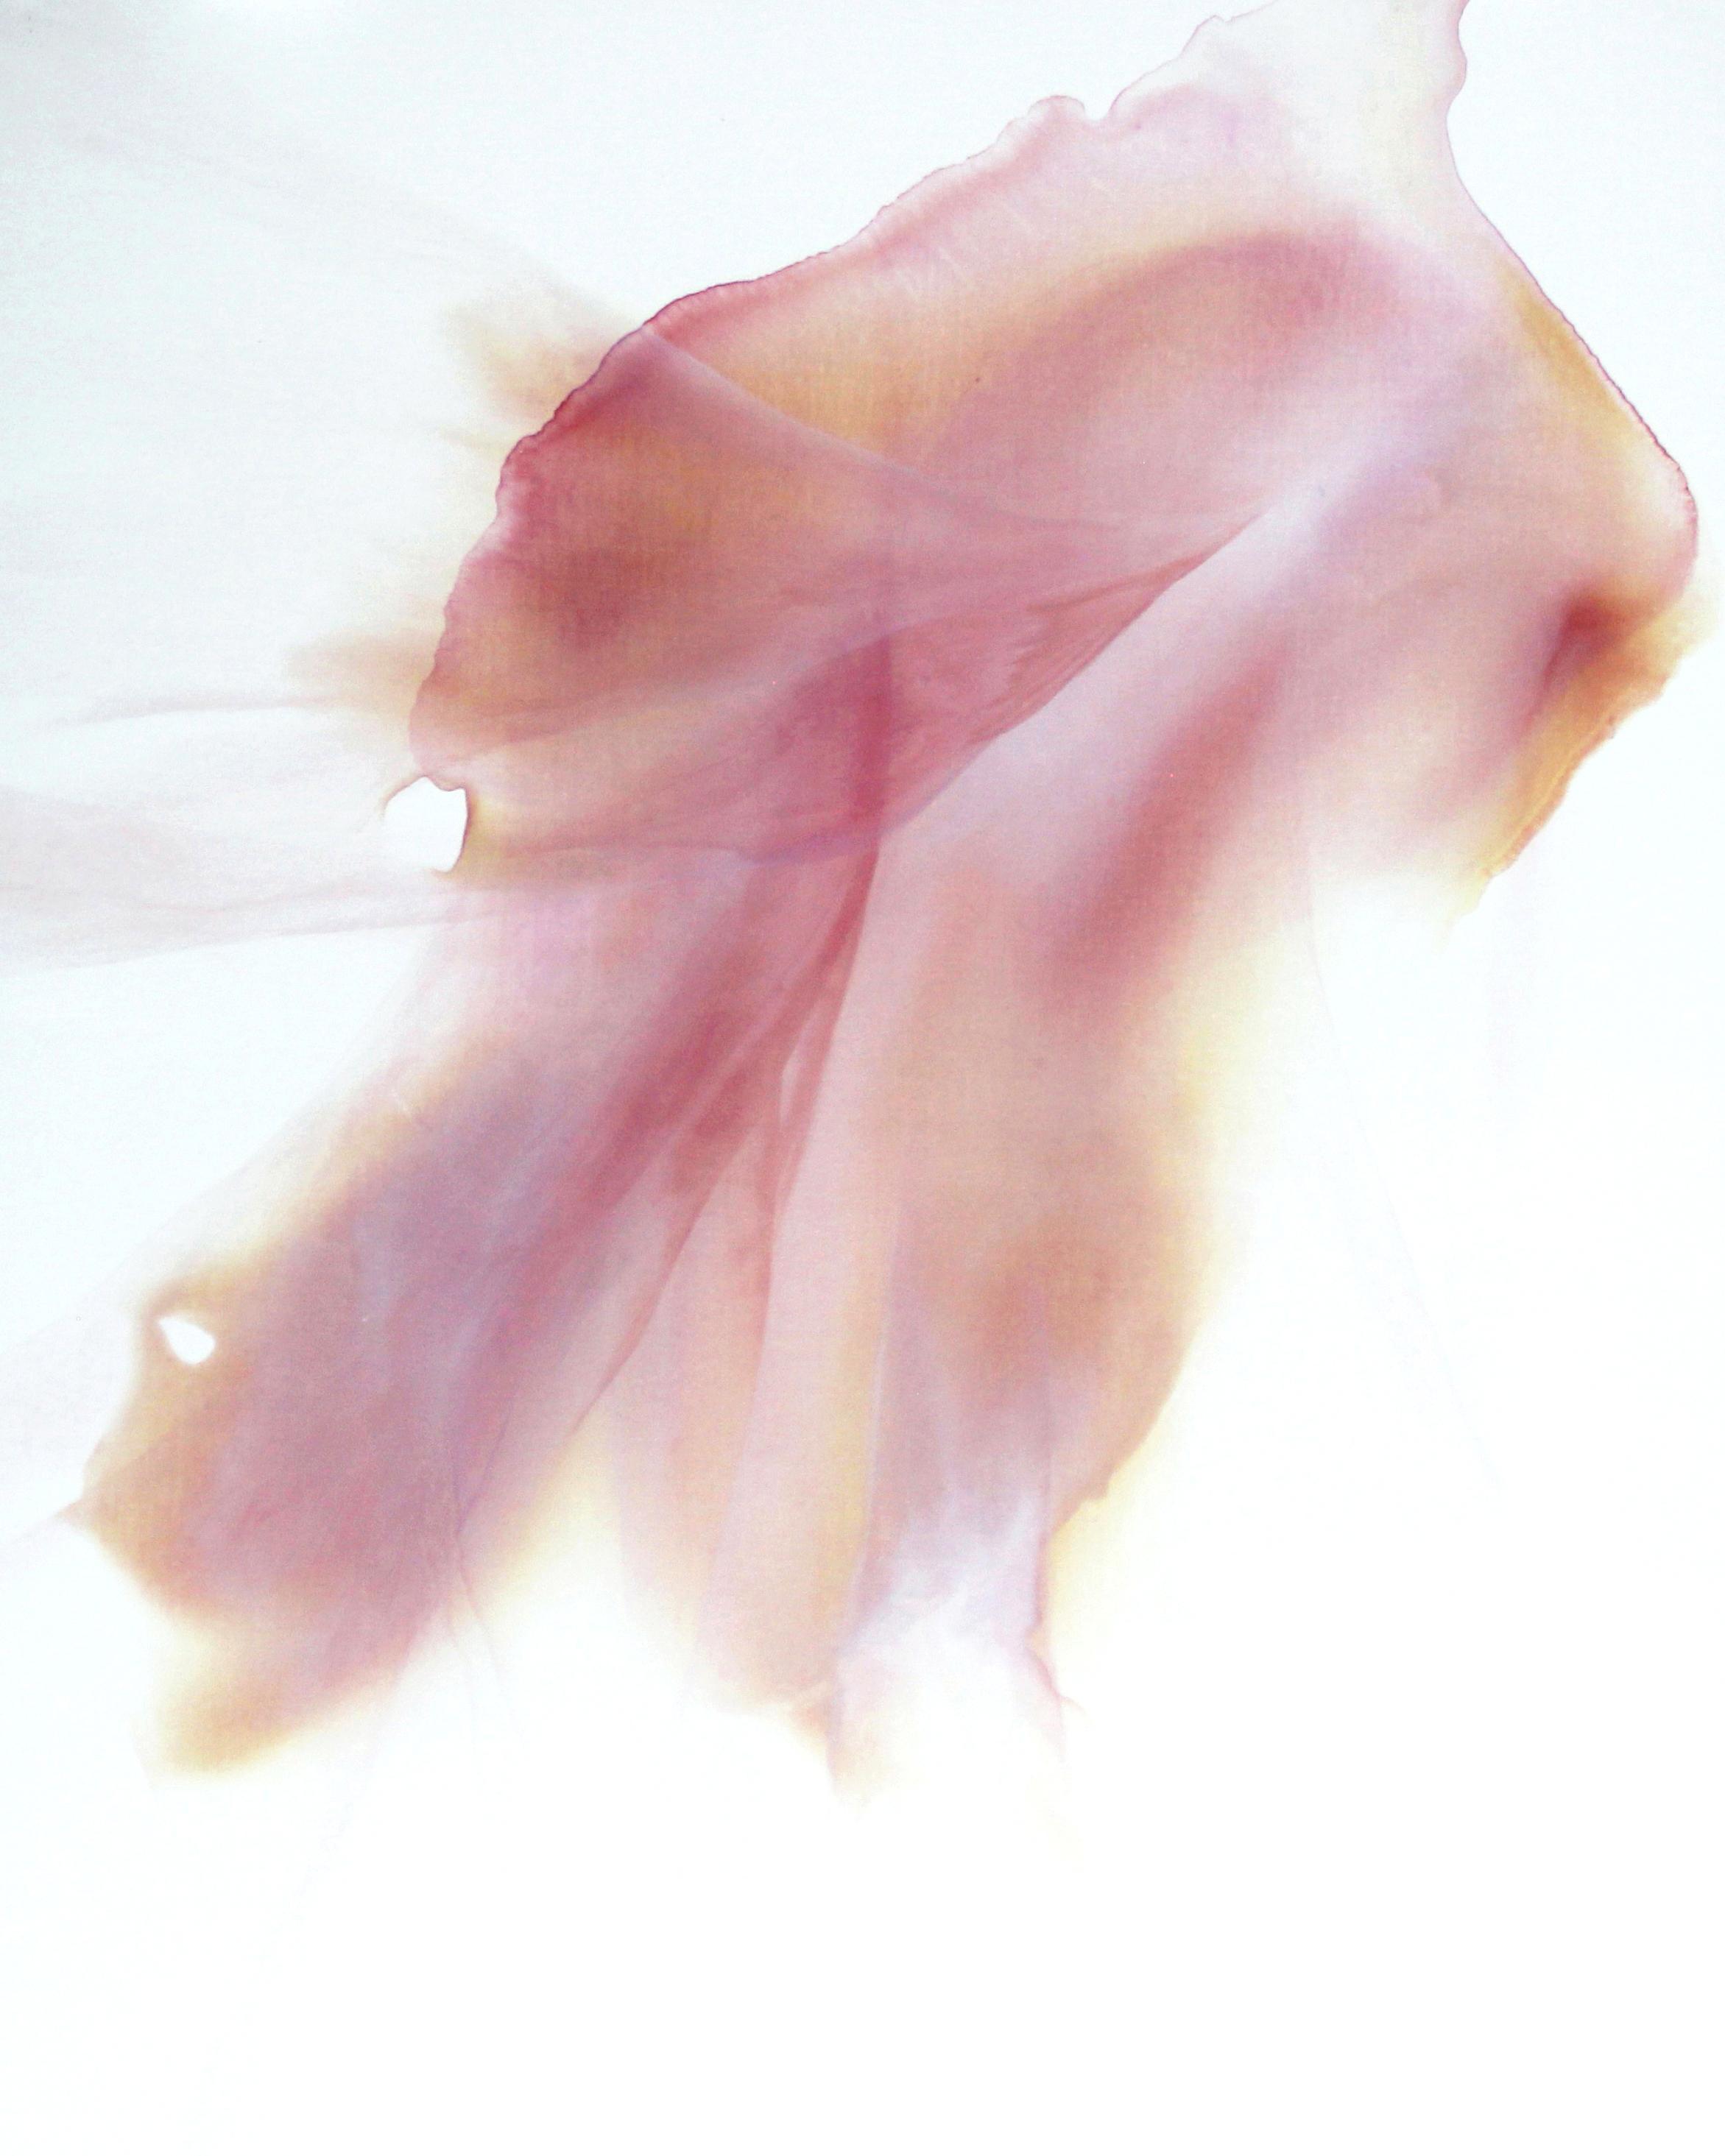 ephemeral_10  oil on canvas  91 X 117 cm  2017